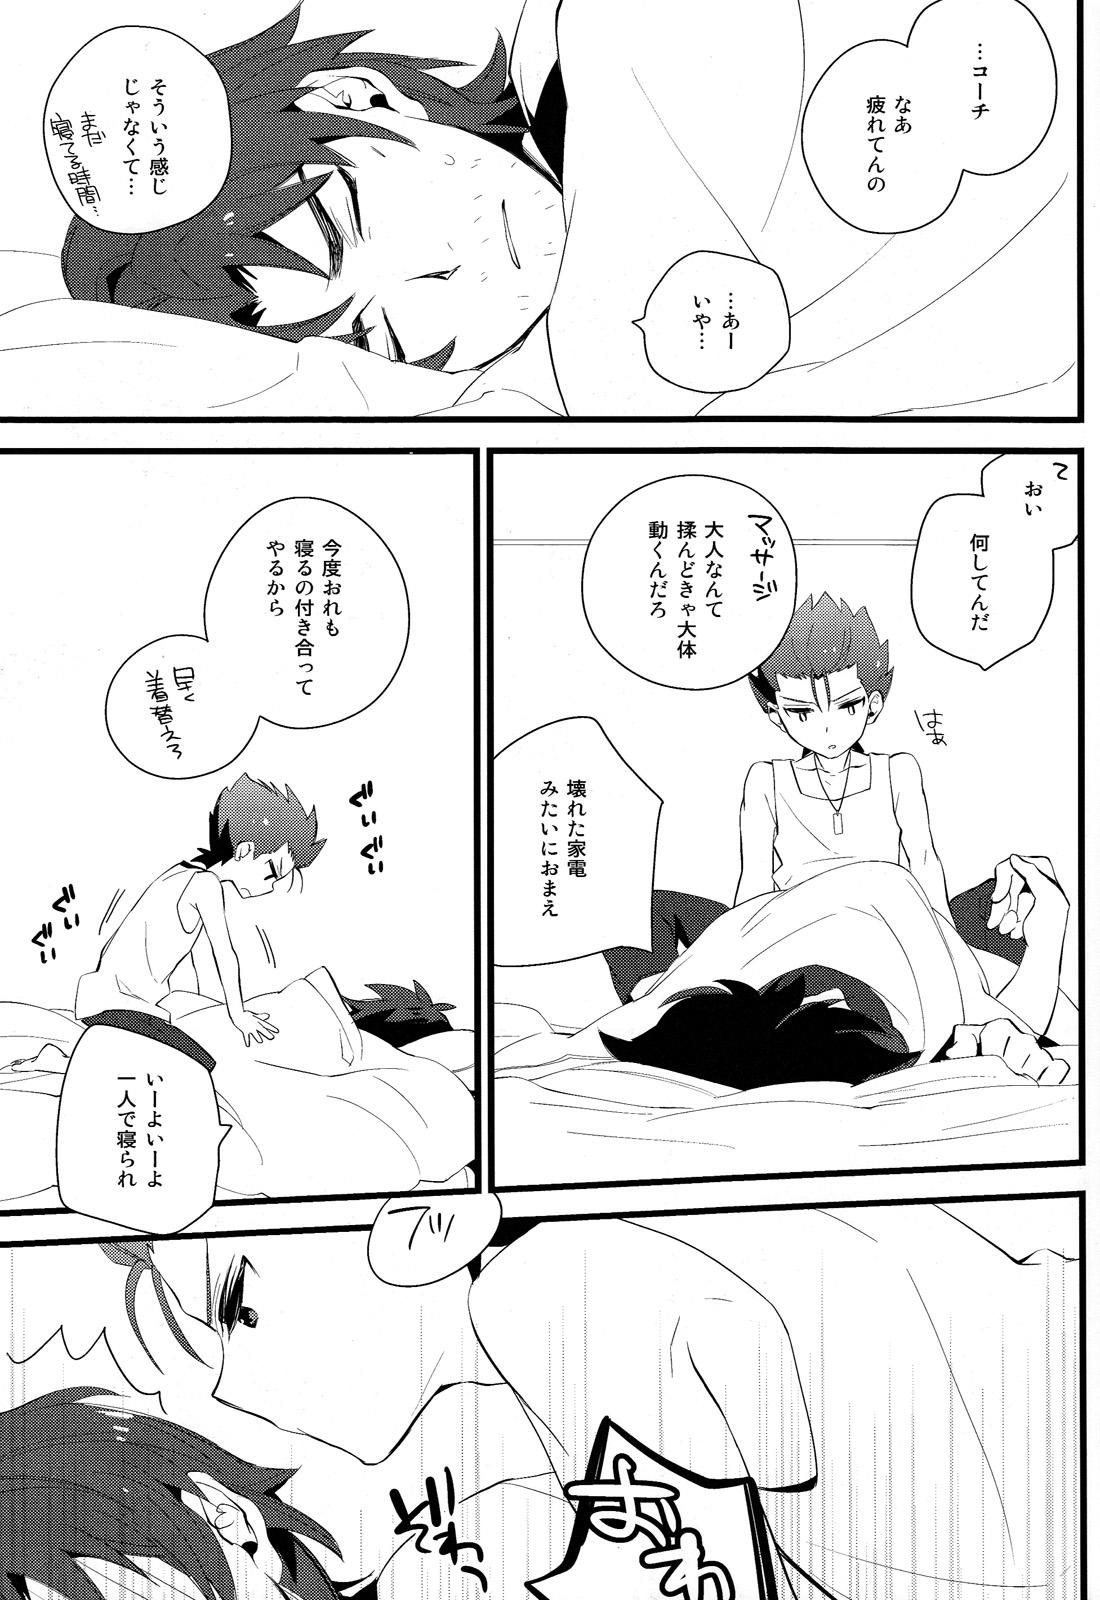 Zenbu Coach no Shigoto 7